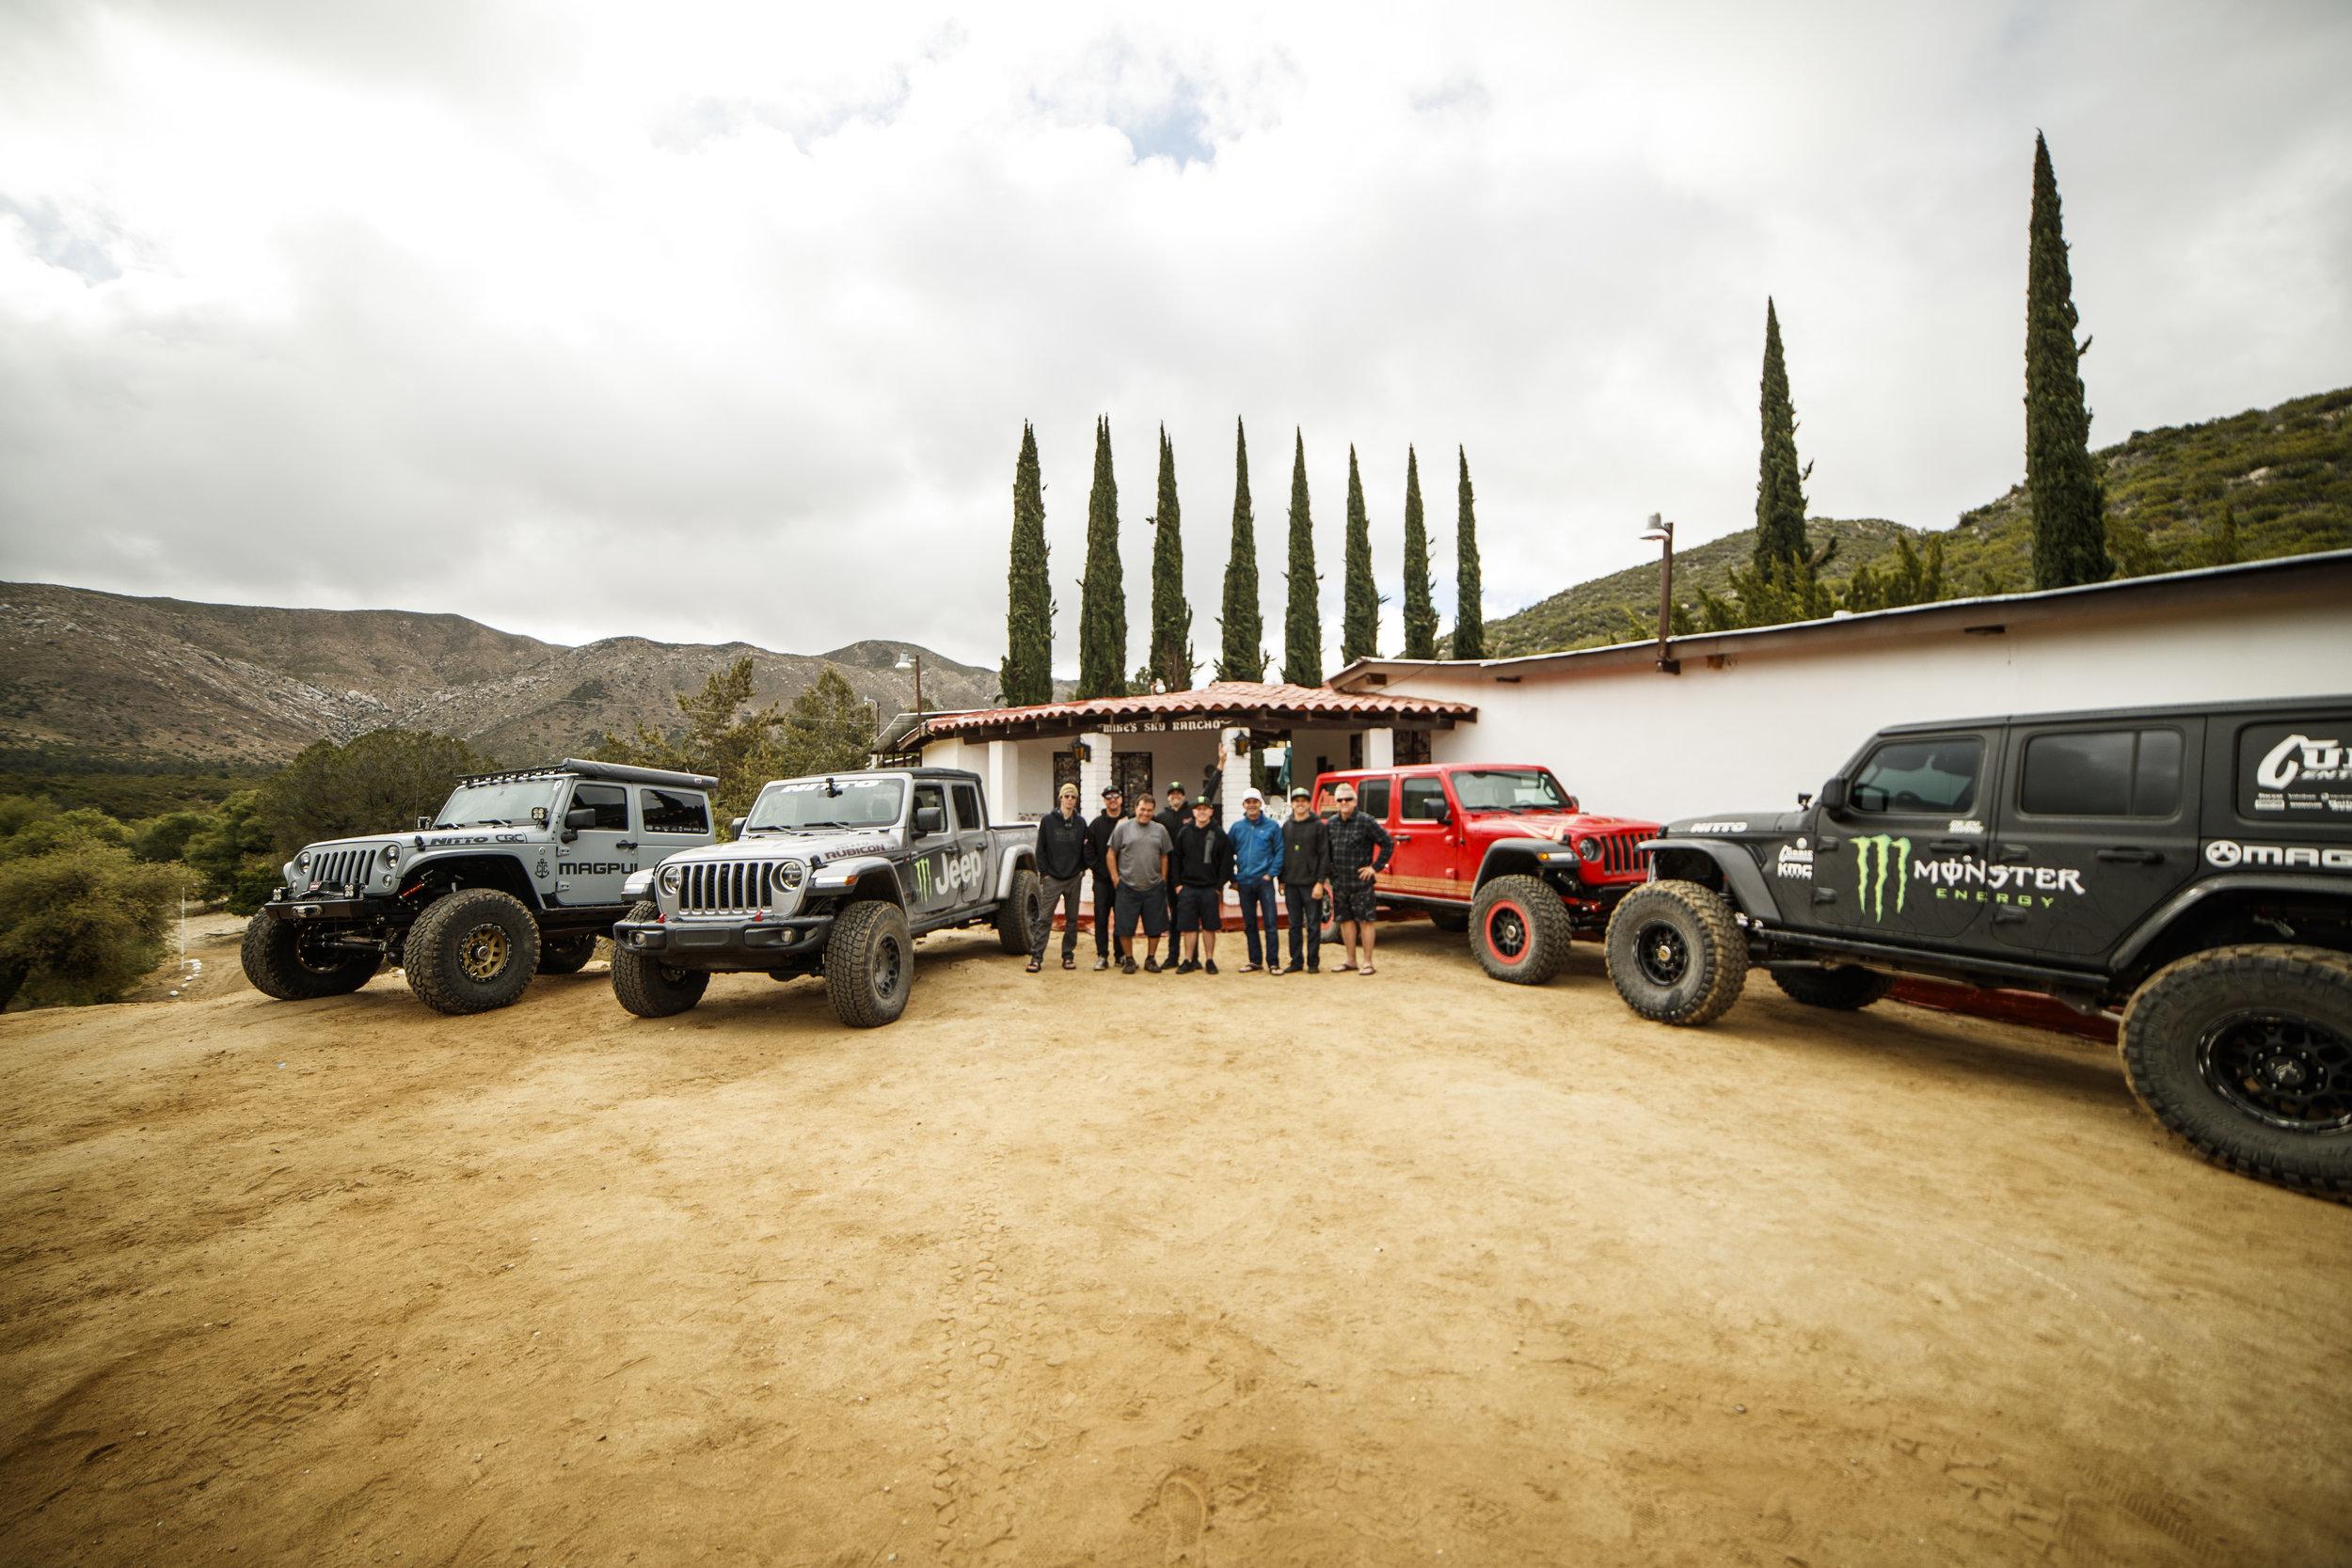 6_24_CaseyCurrie_Baja500PreRunning_BajaMexico_Jeep_010.jpg